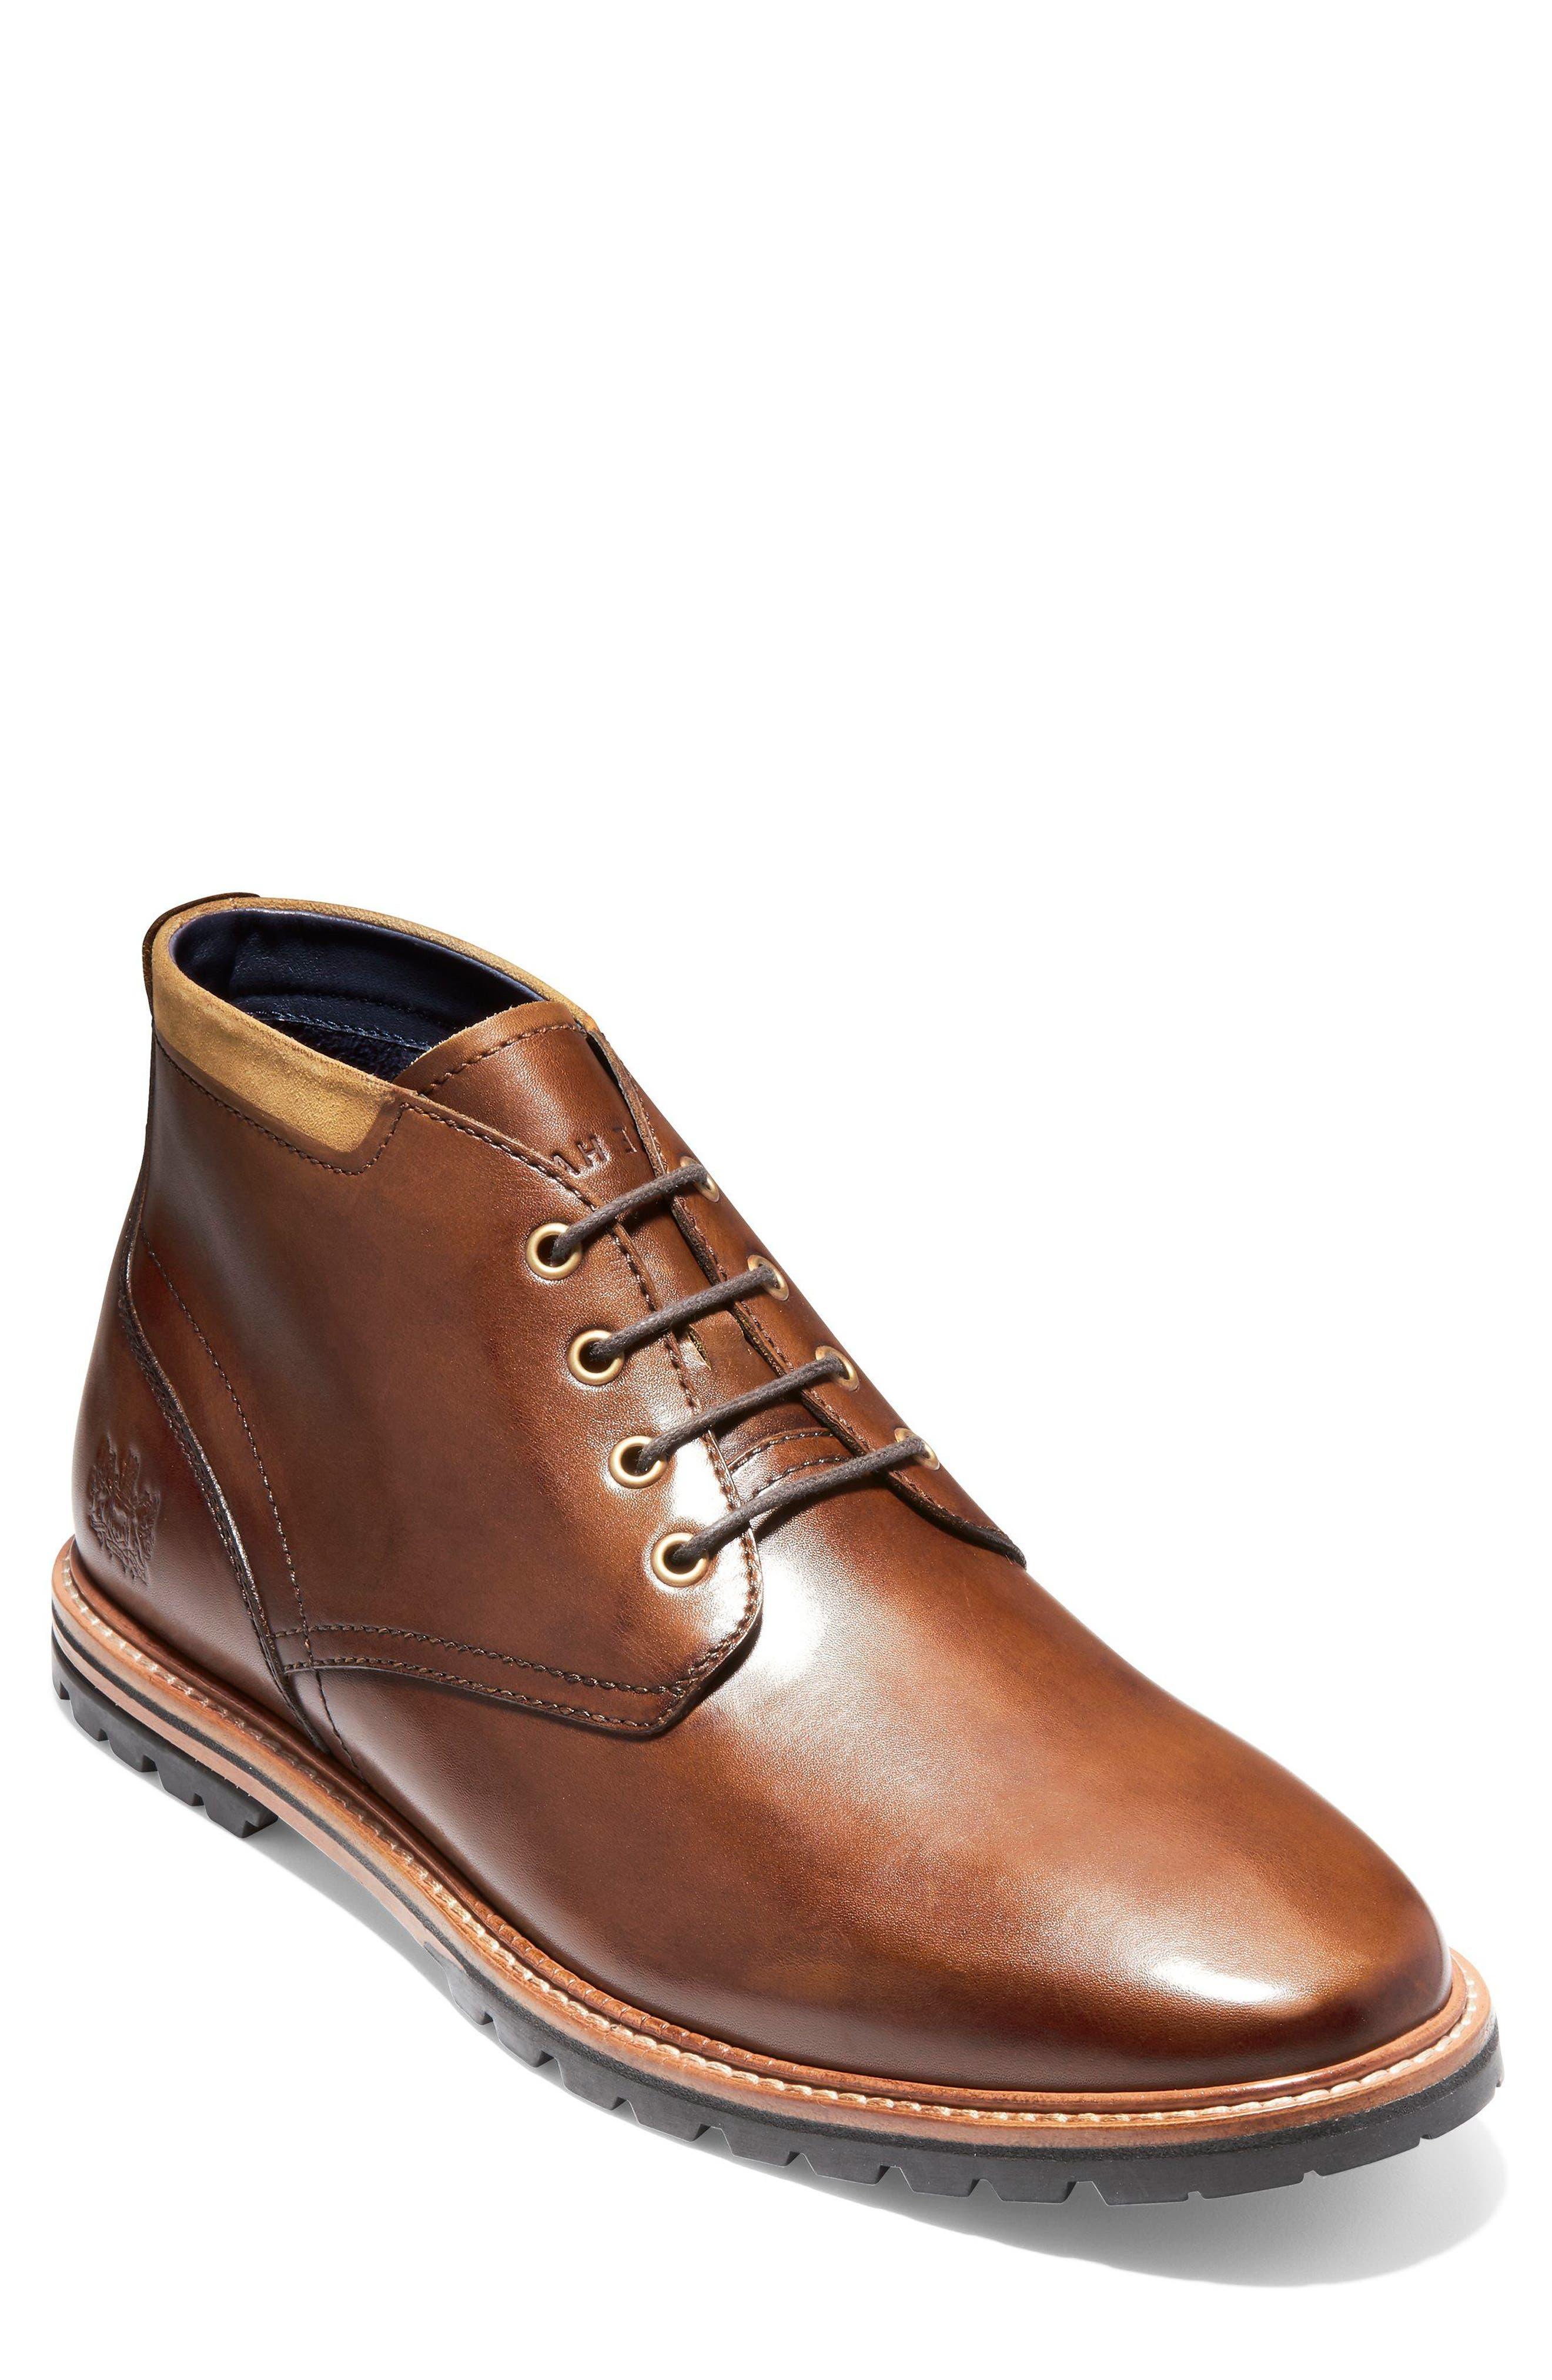 Cole Haan Raymond Grand Chukka Boot, Brown